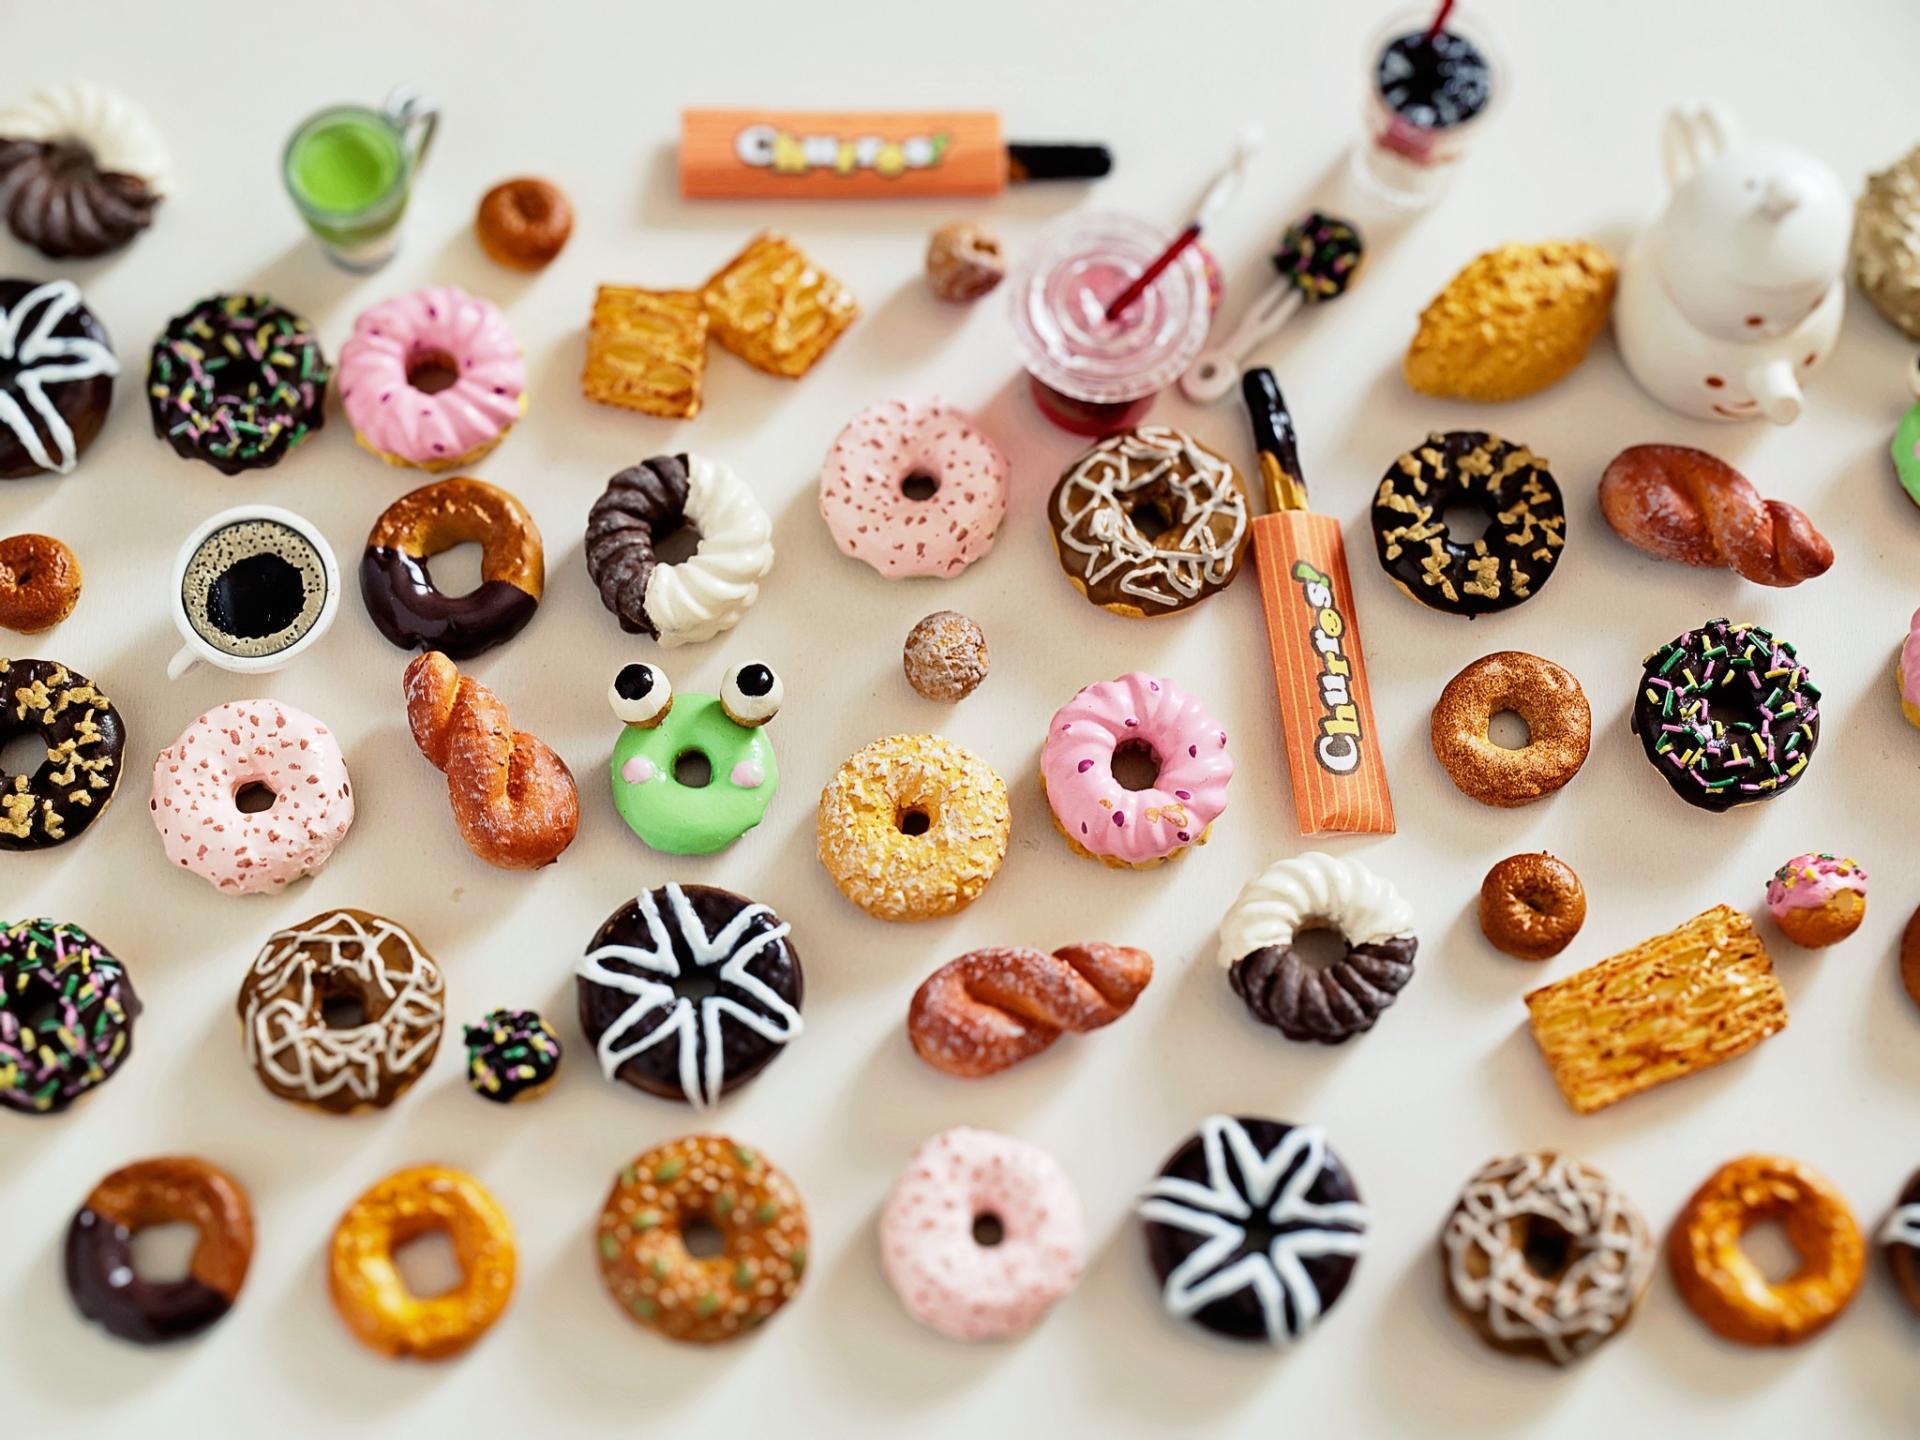 donut wallpaper hd